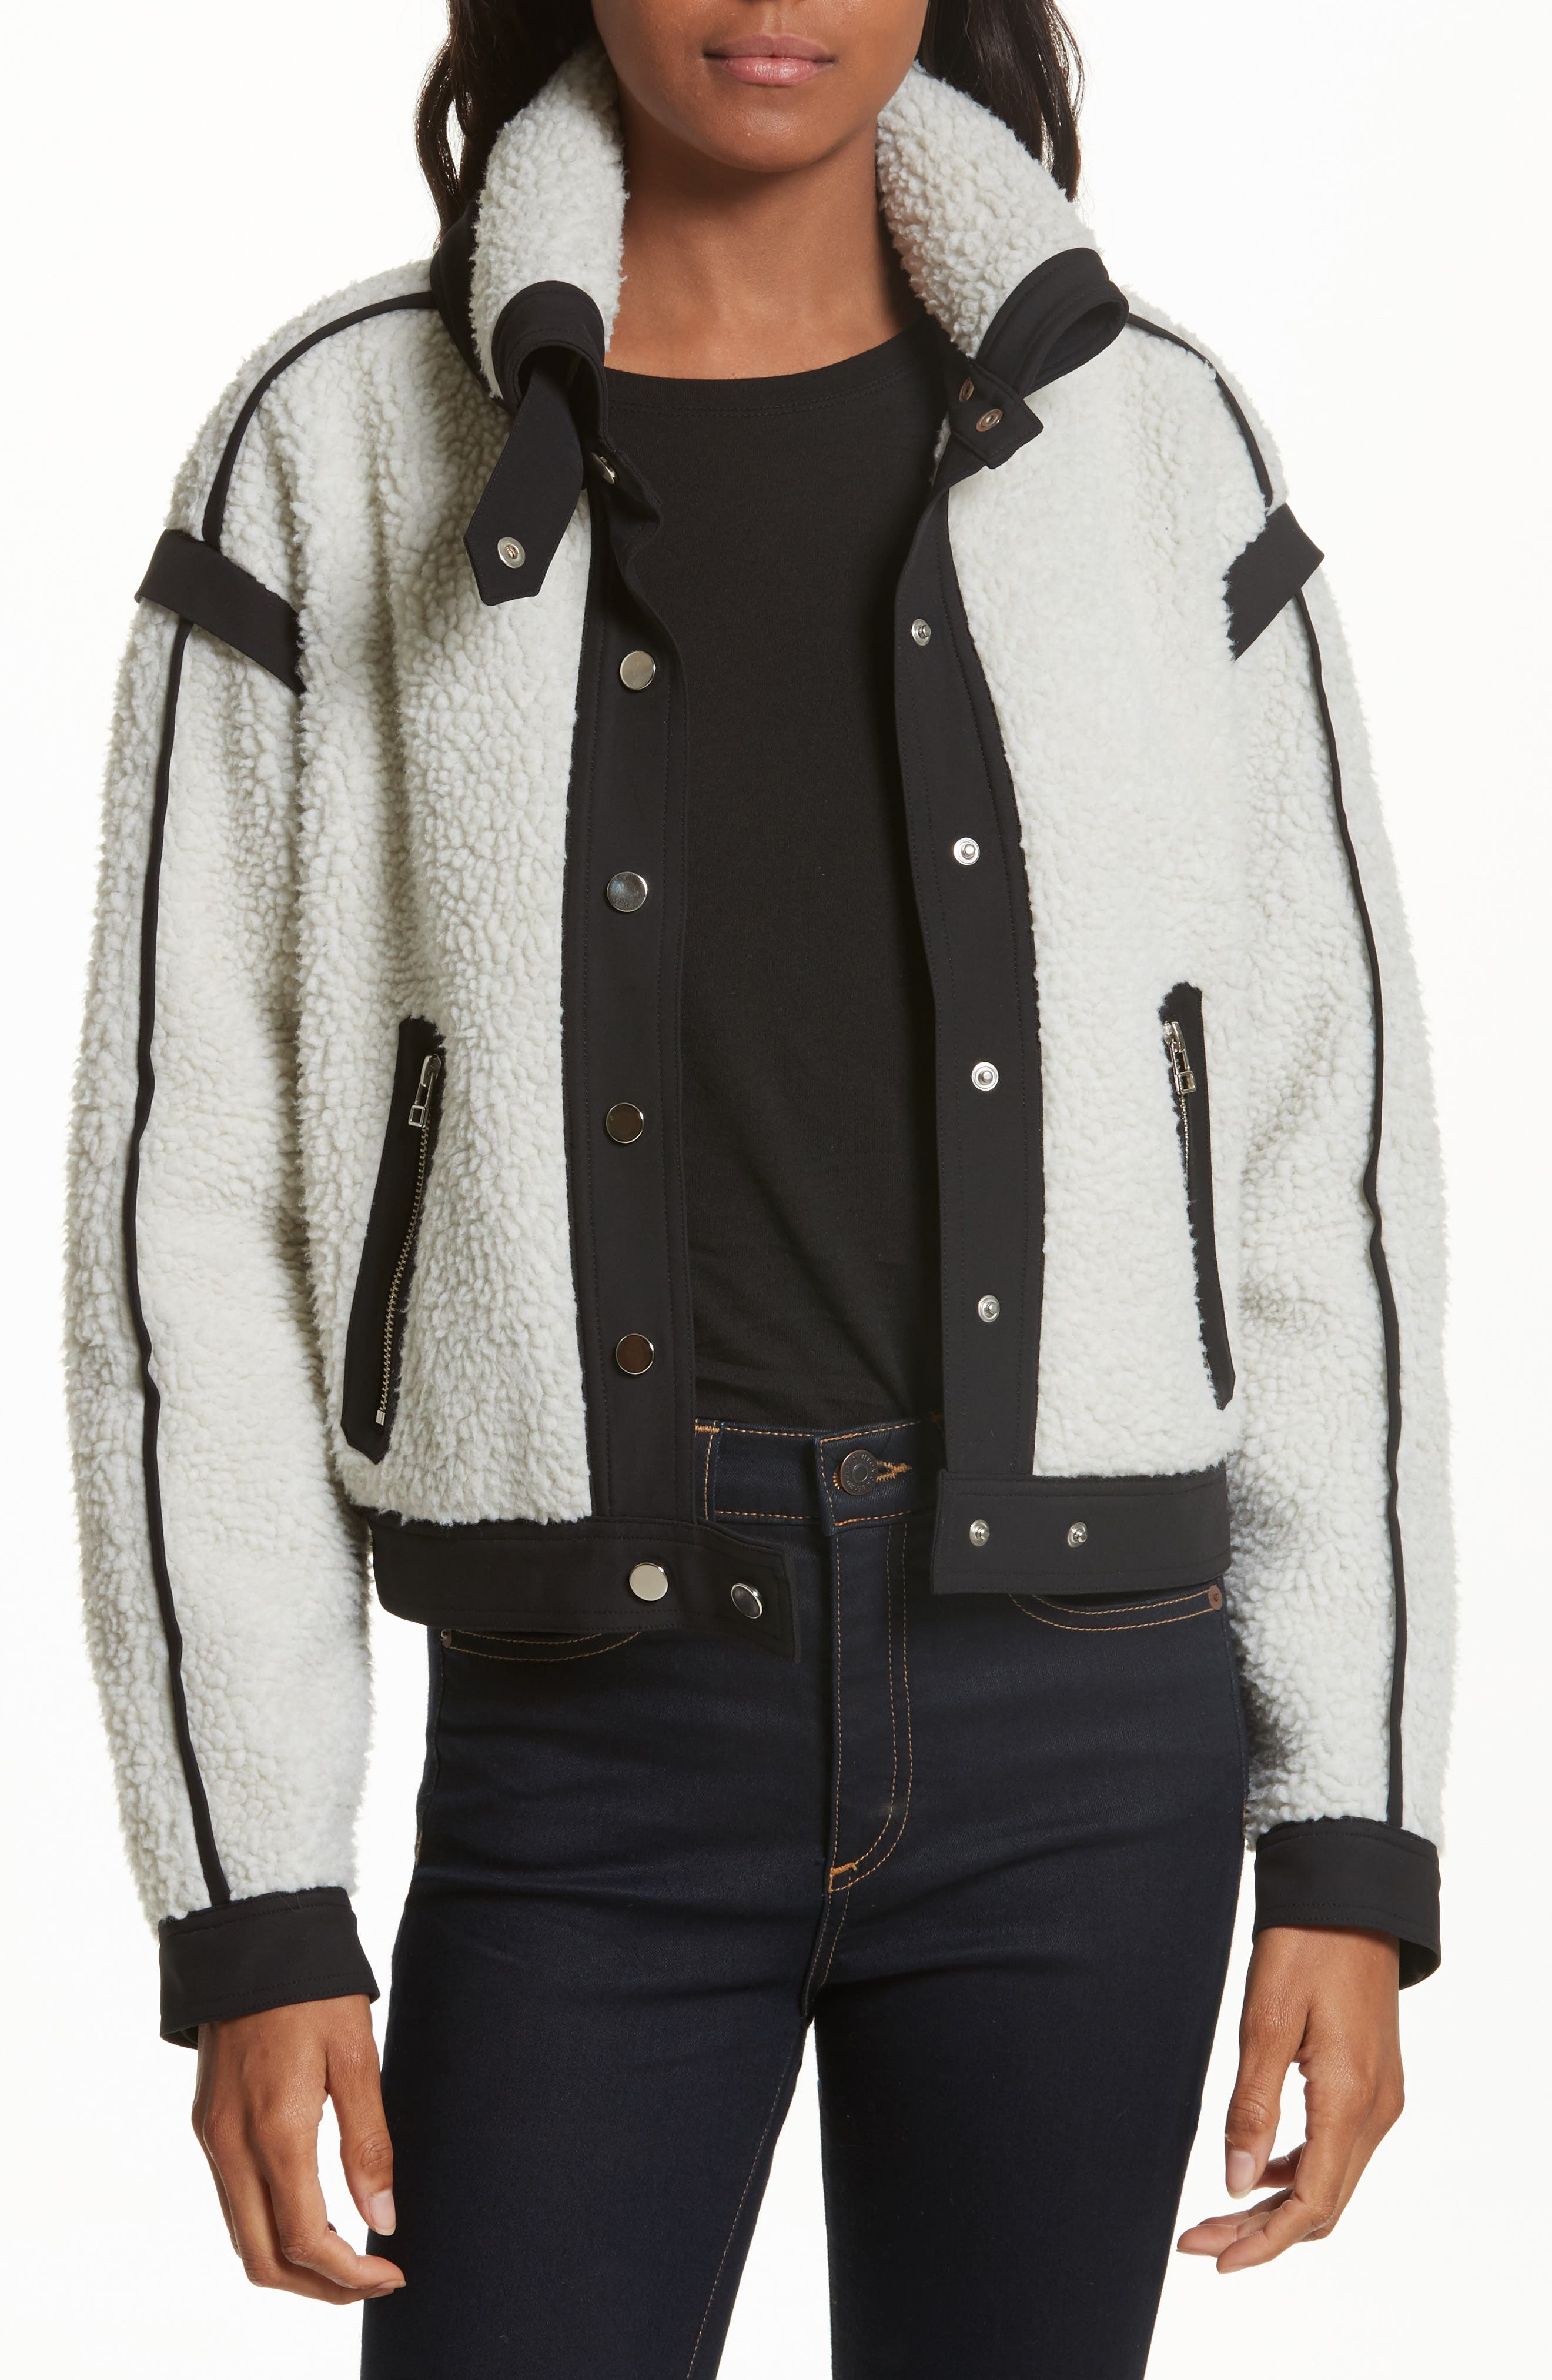 Veronica Beard Anita Fleece Jacket